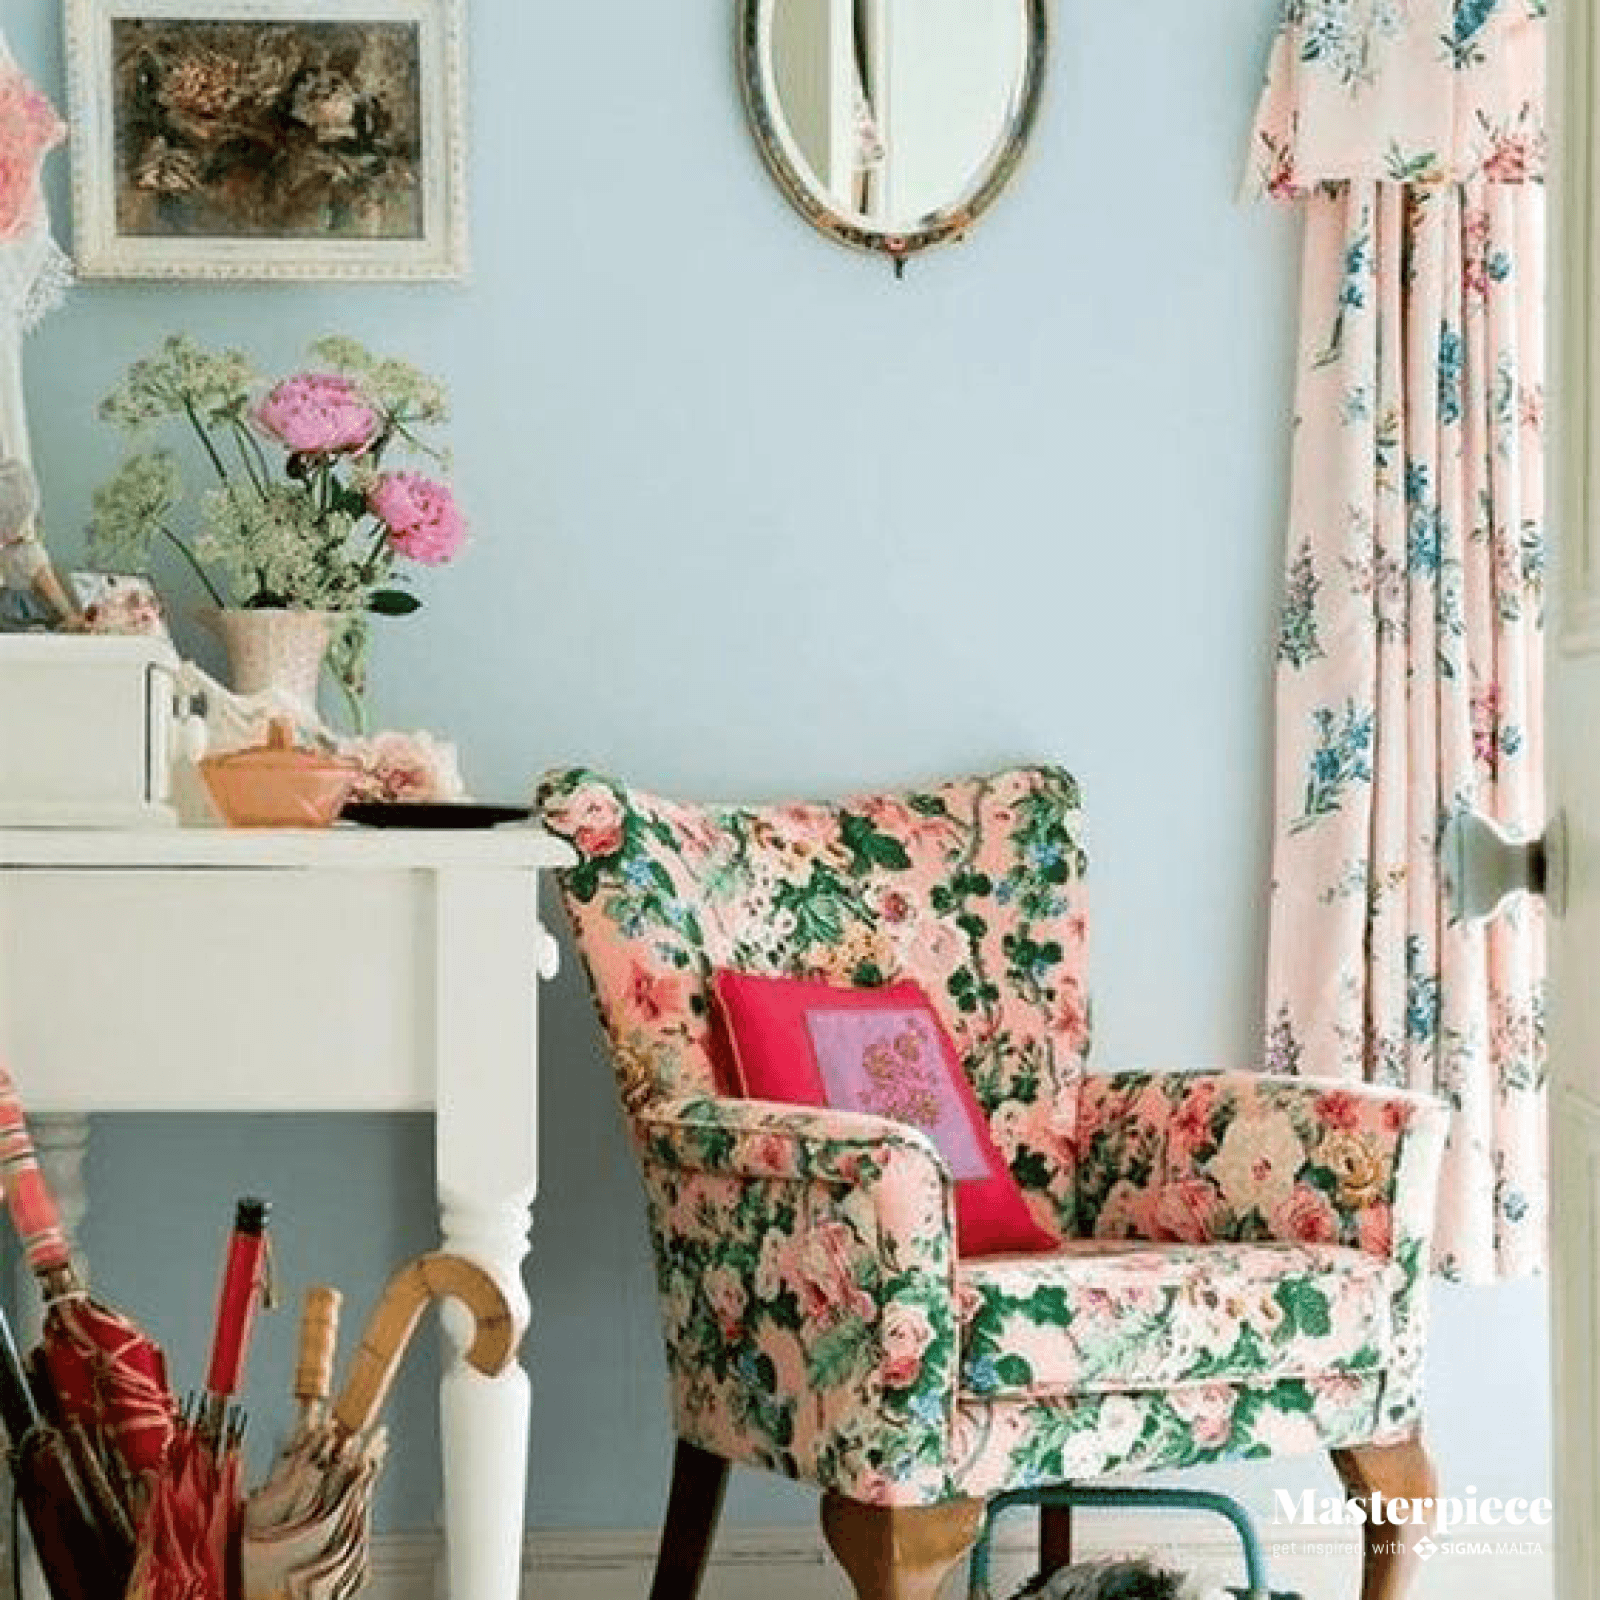 Flowers and Vintage </br><span> Living room </span>